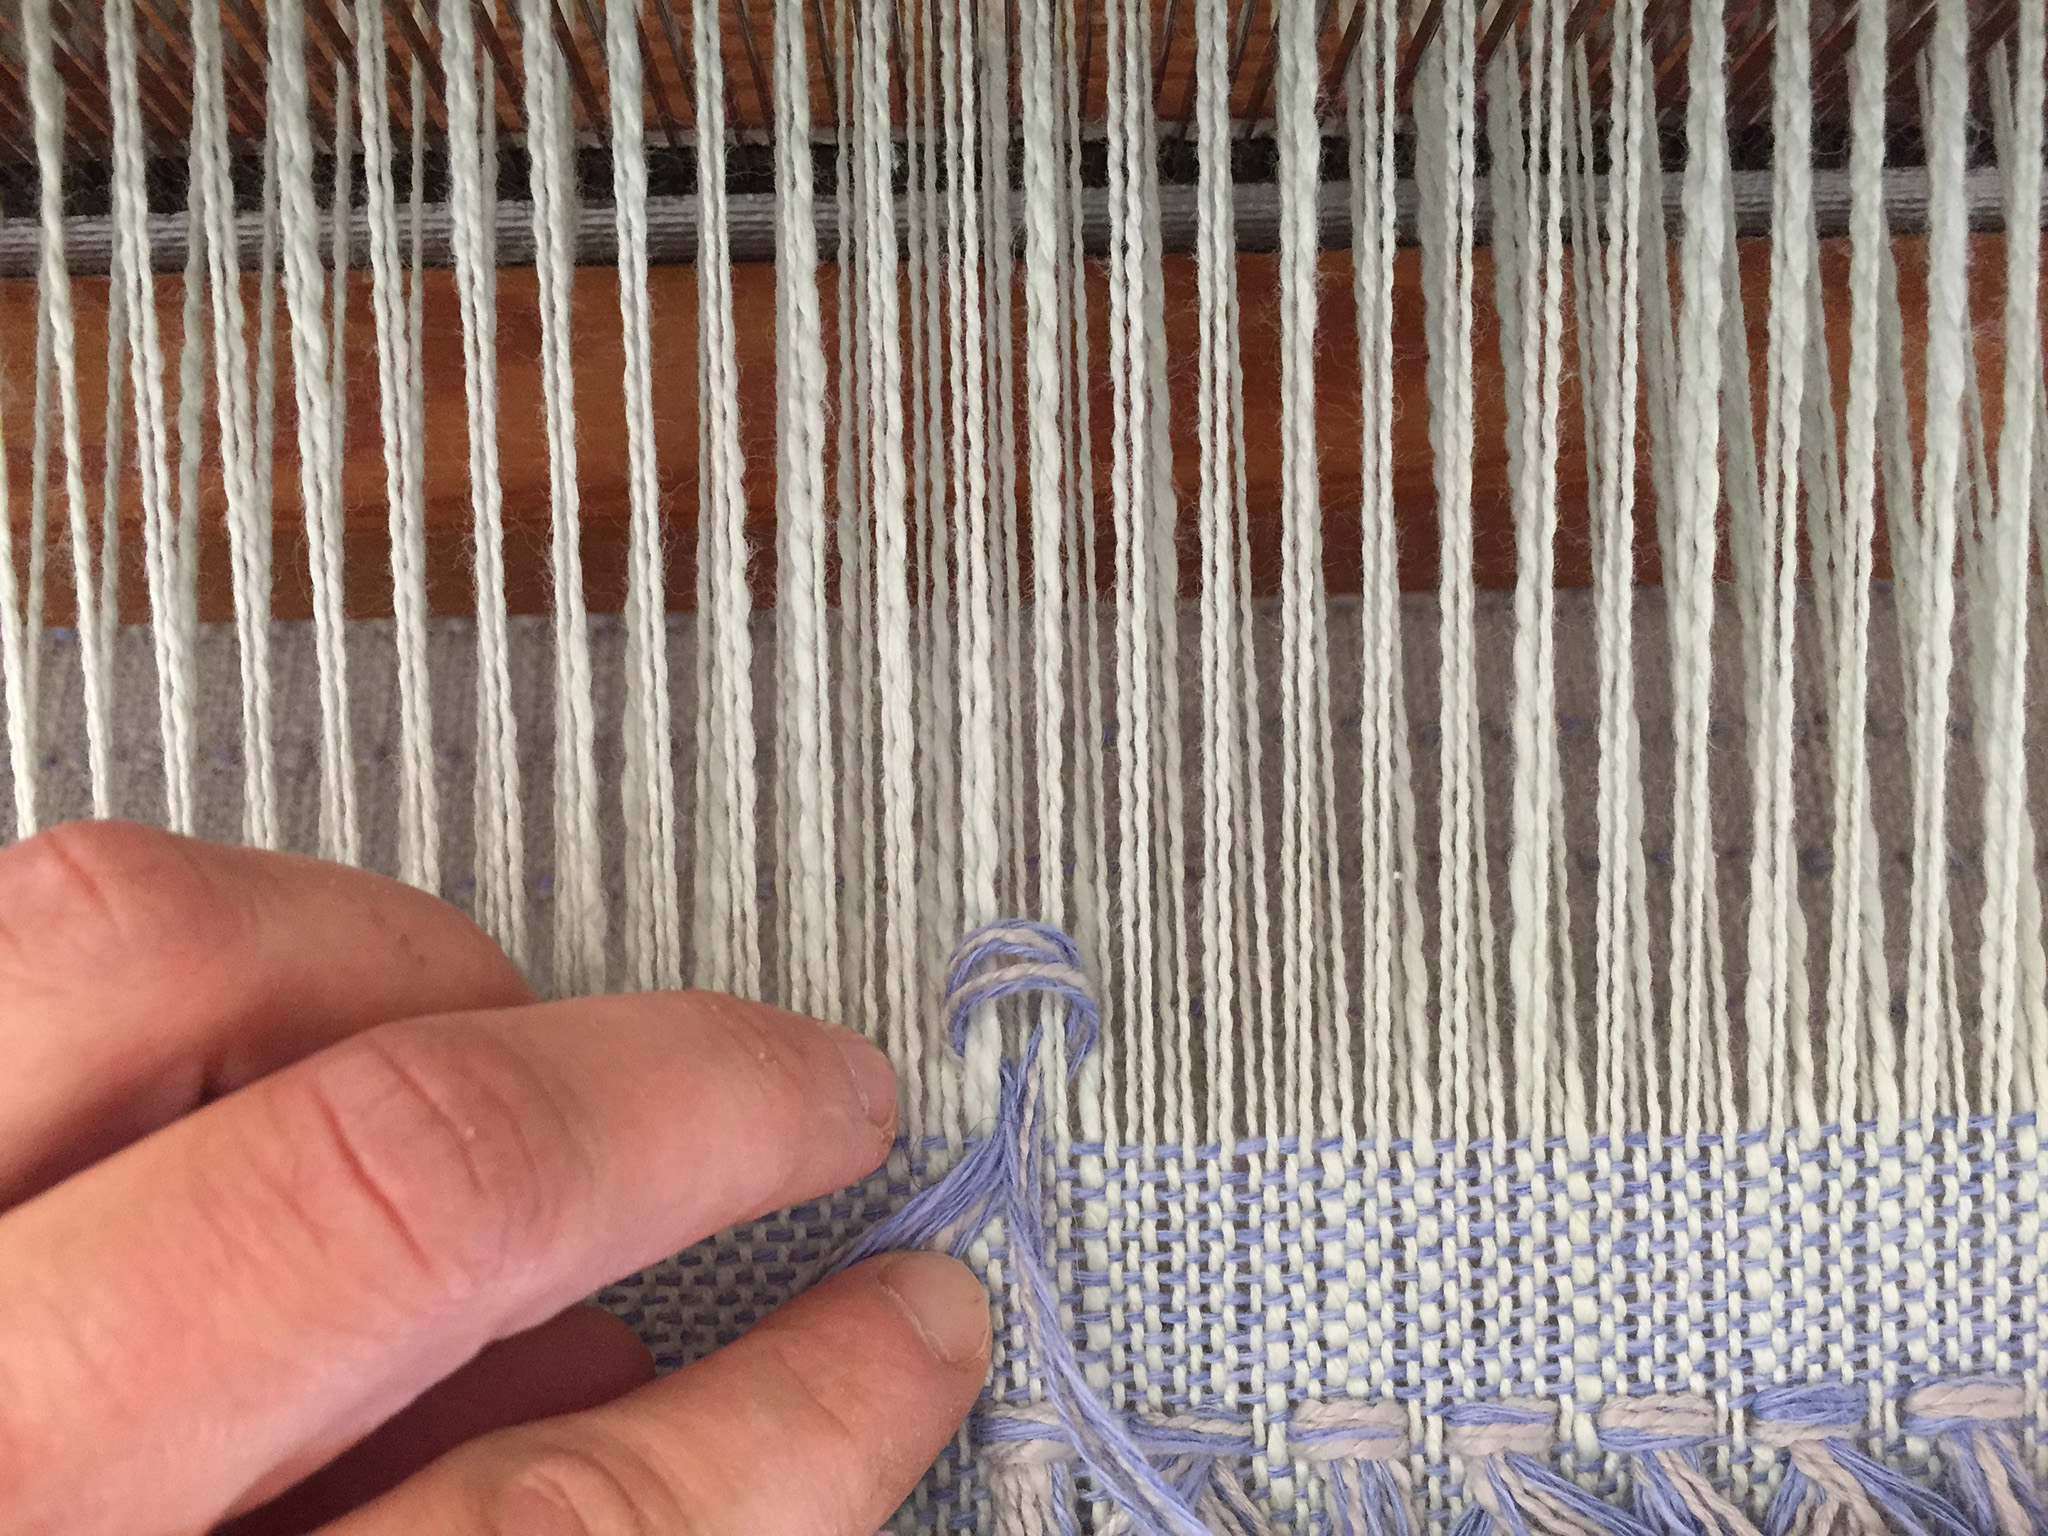 Weaving the Handwoven Gosling Pillows